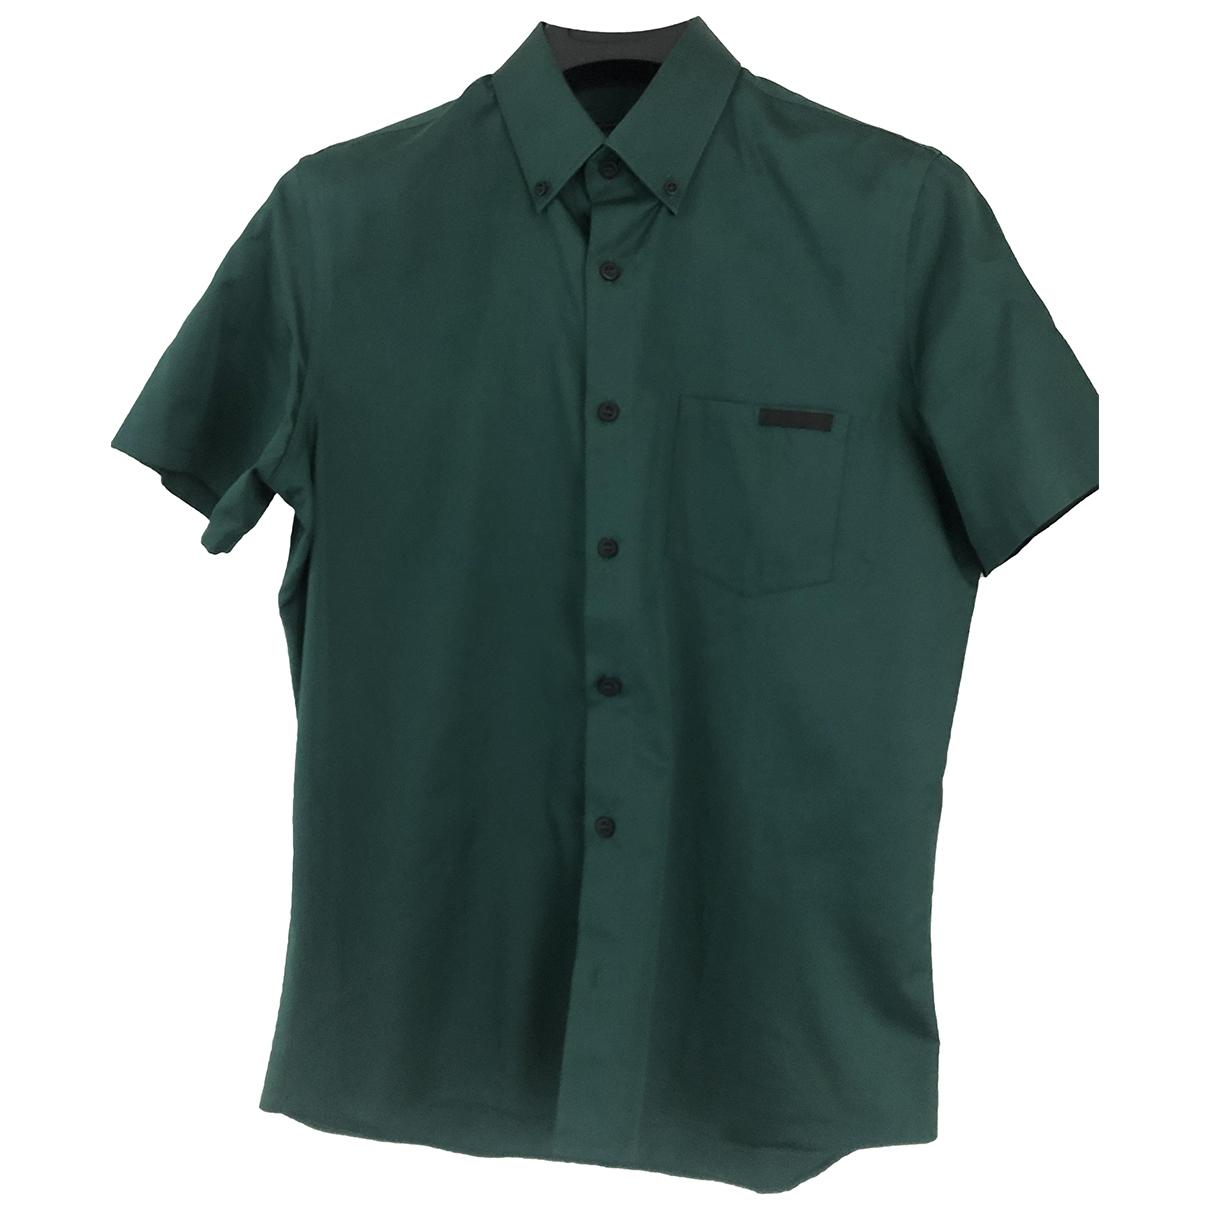 Prada \N Hemden in  Gruen Baumwolle